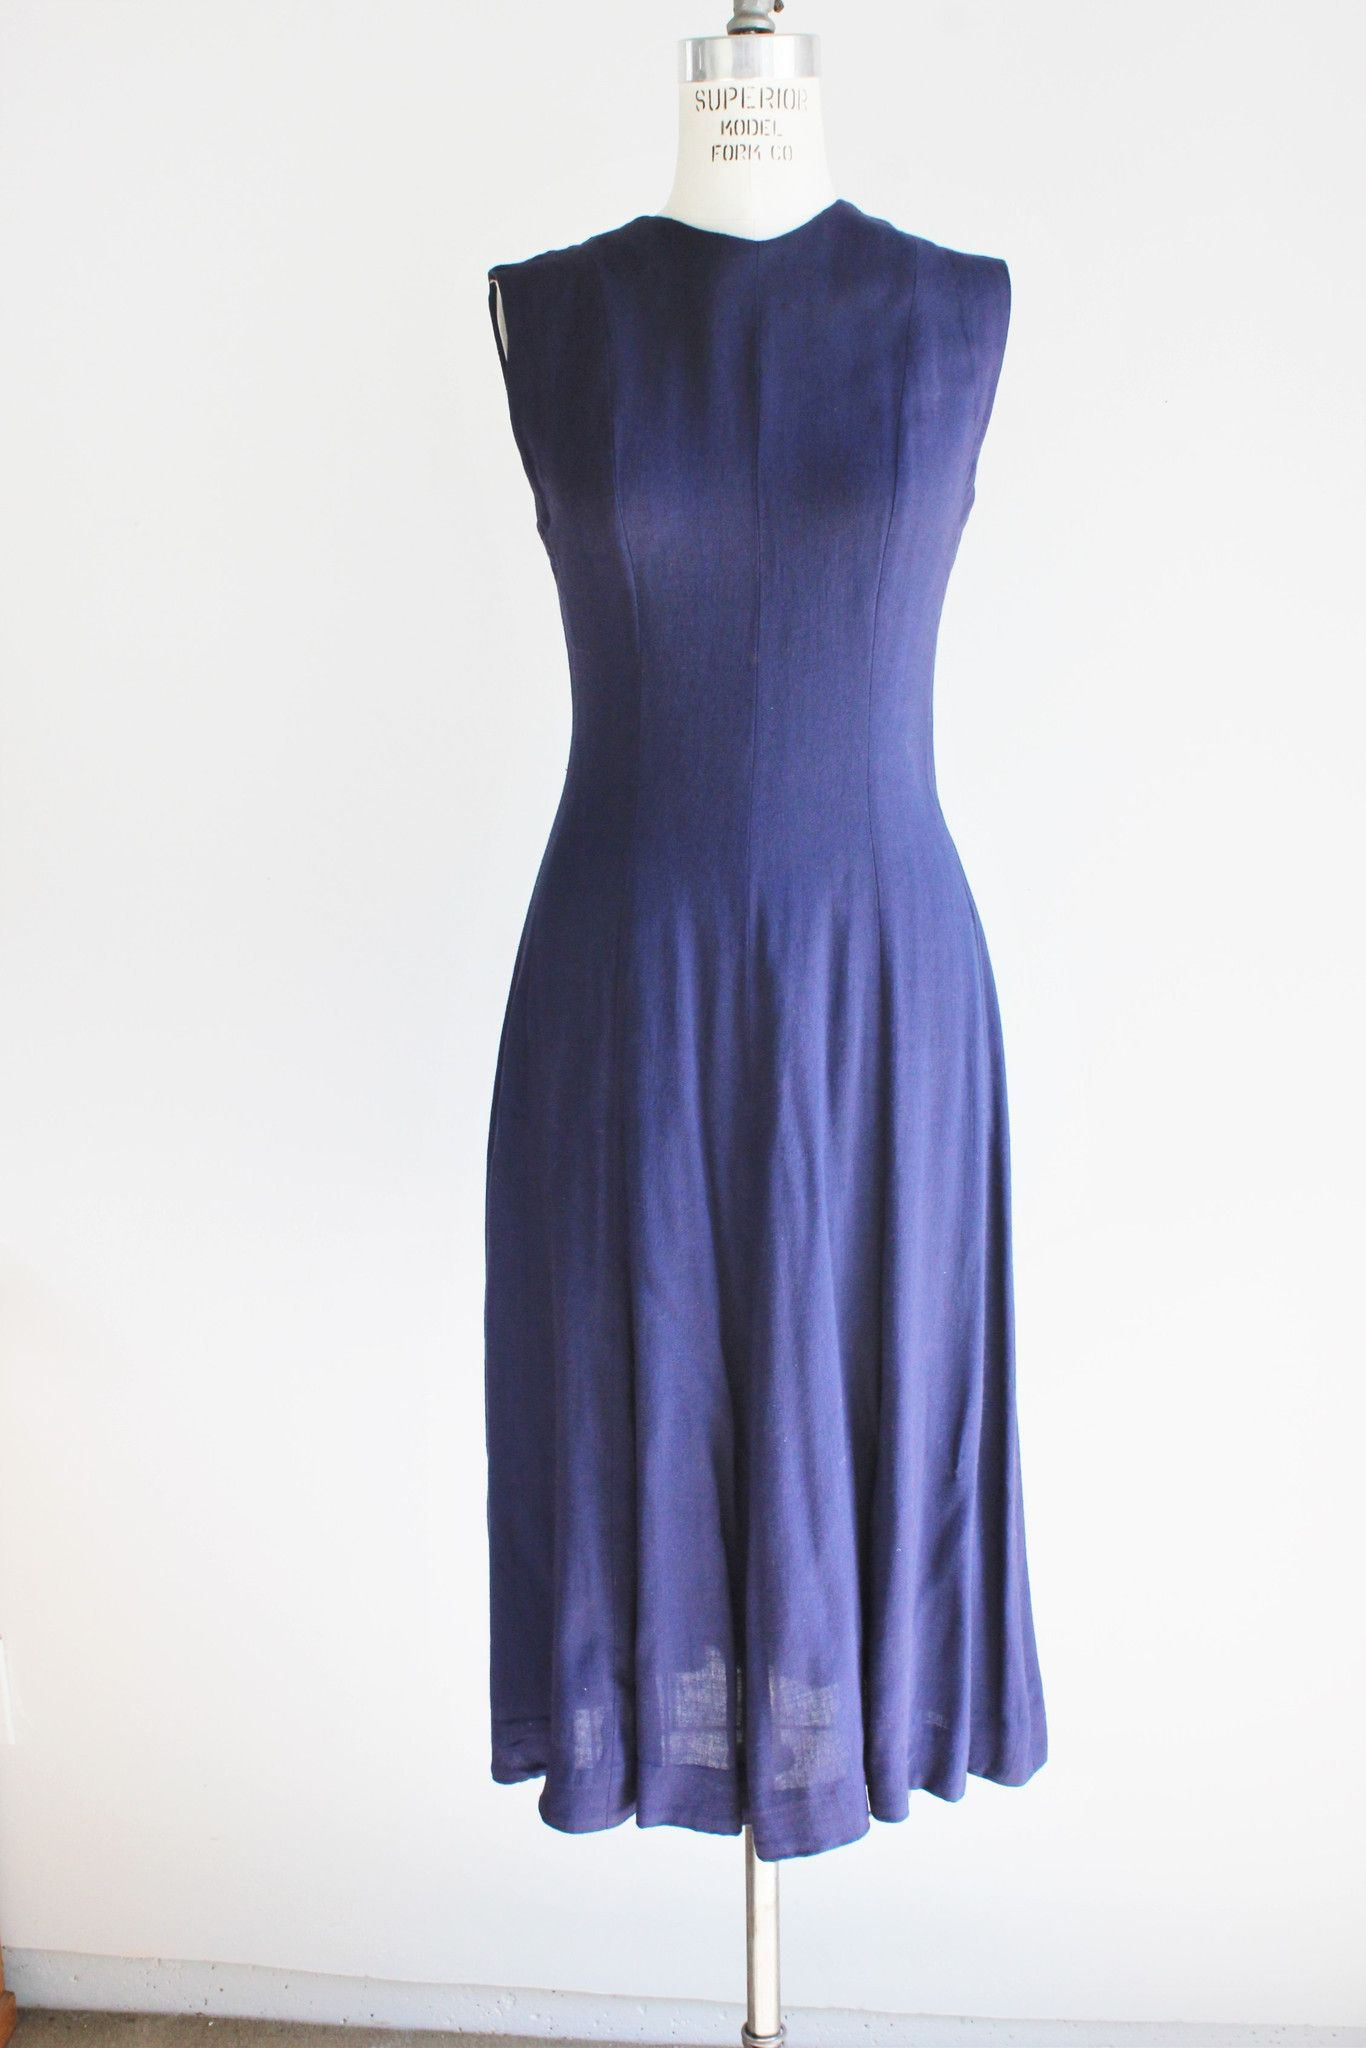 Vintage 1950s Navy Blue Sleeveless Summer Dress